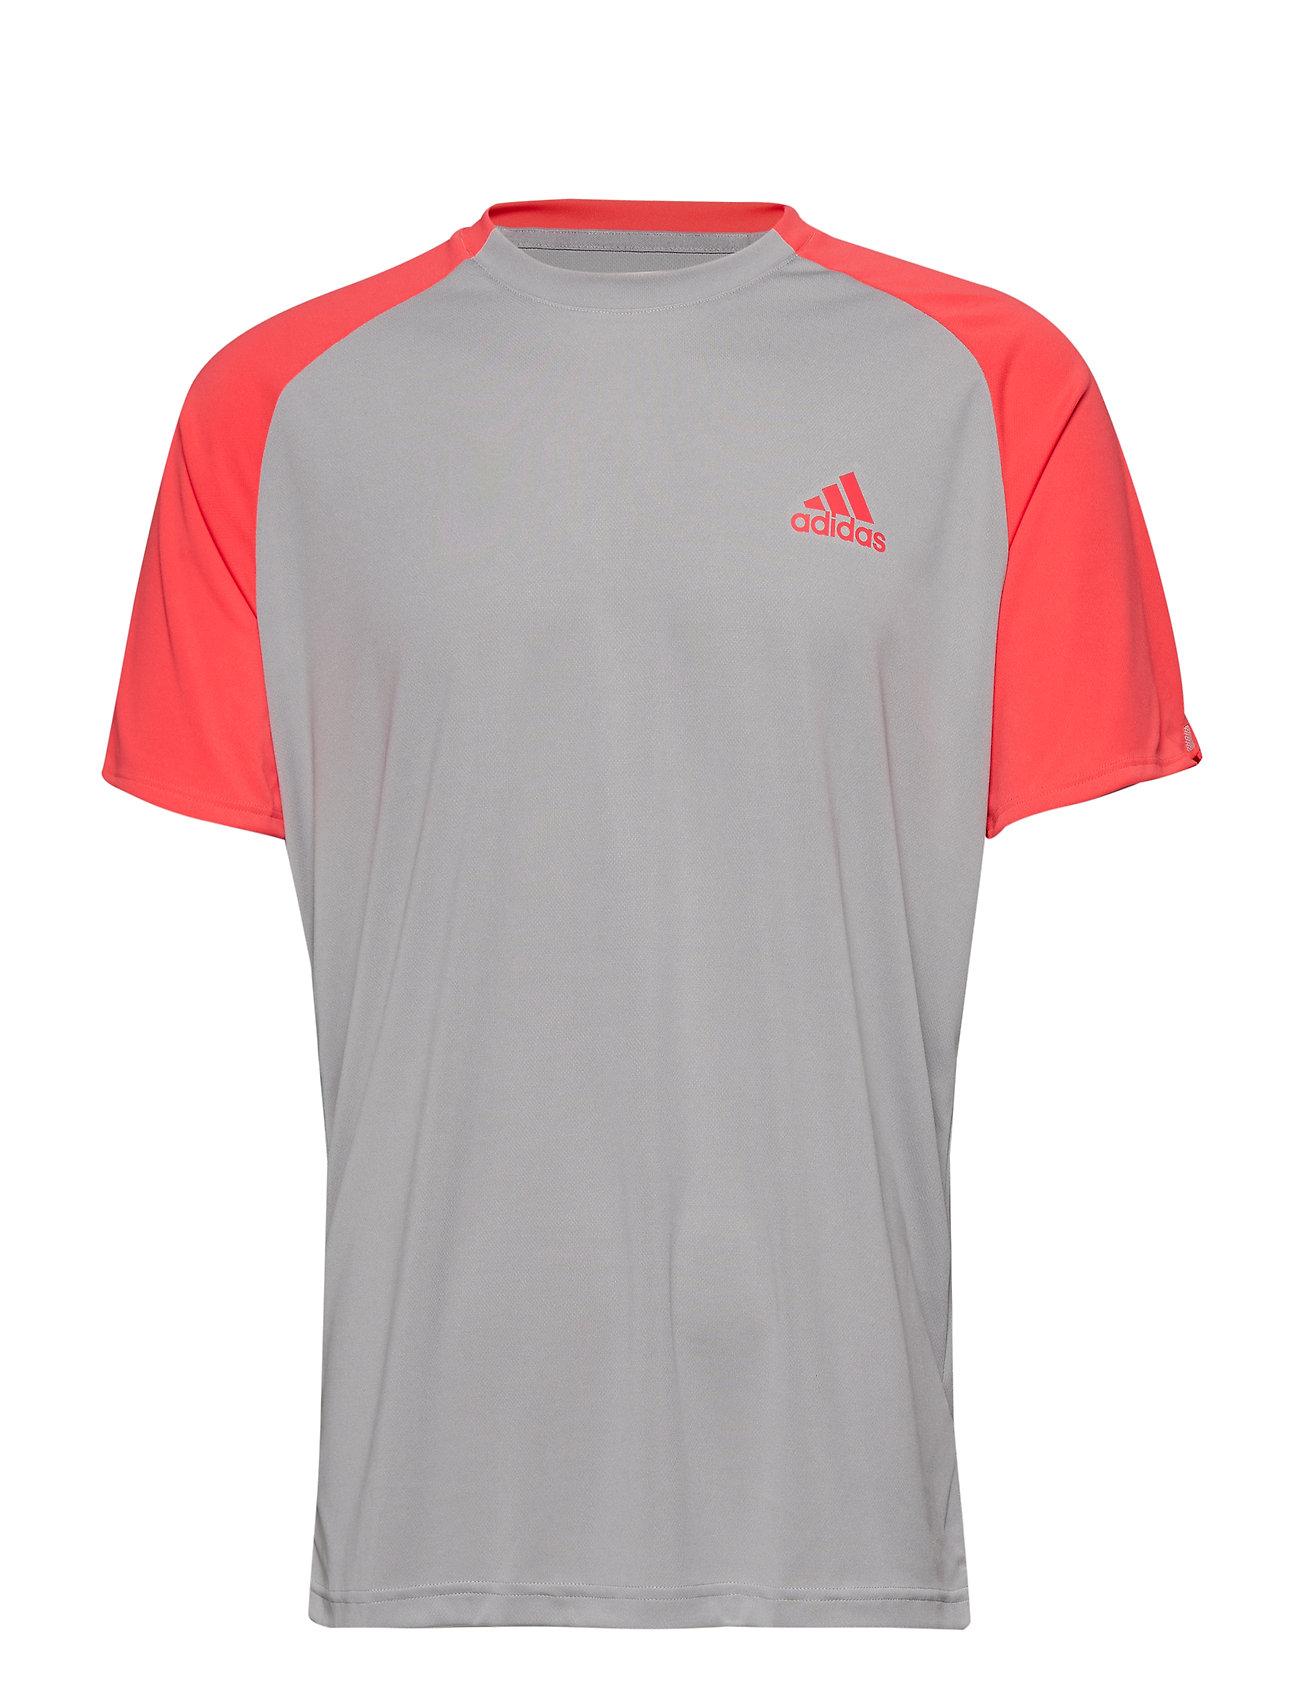 adidas Tennis CLUB C/B TEE M - GREY